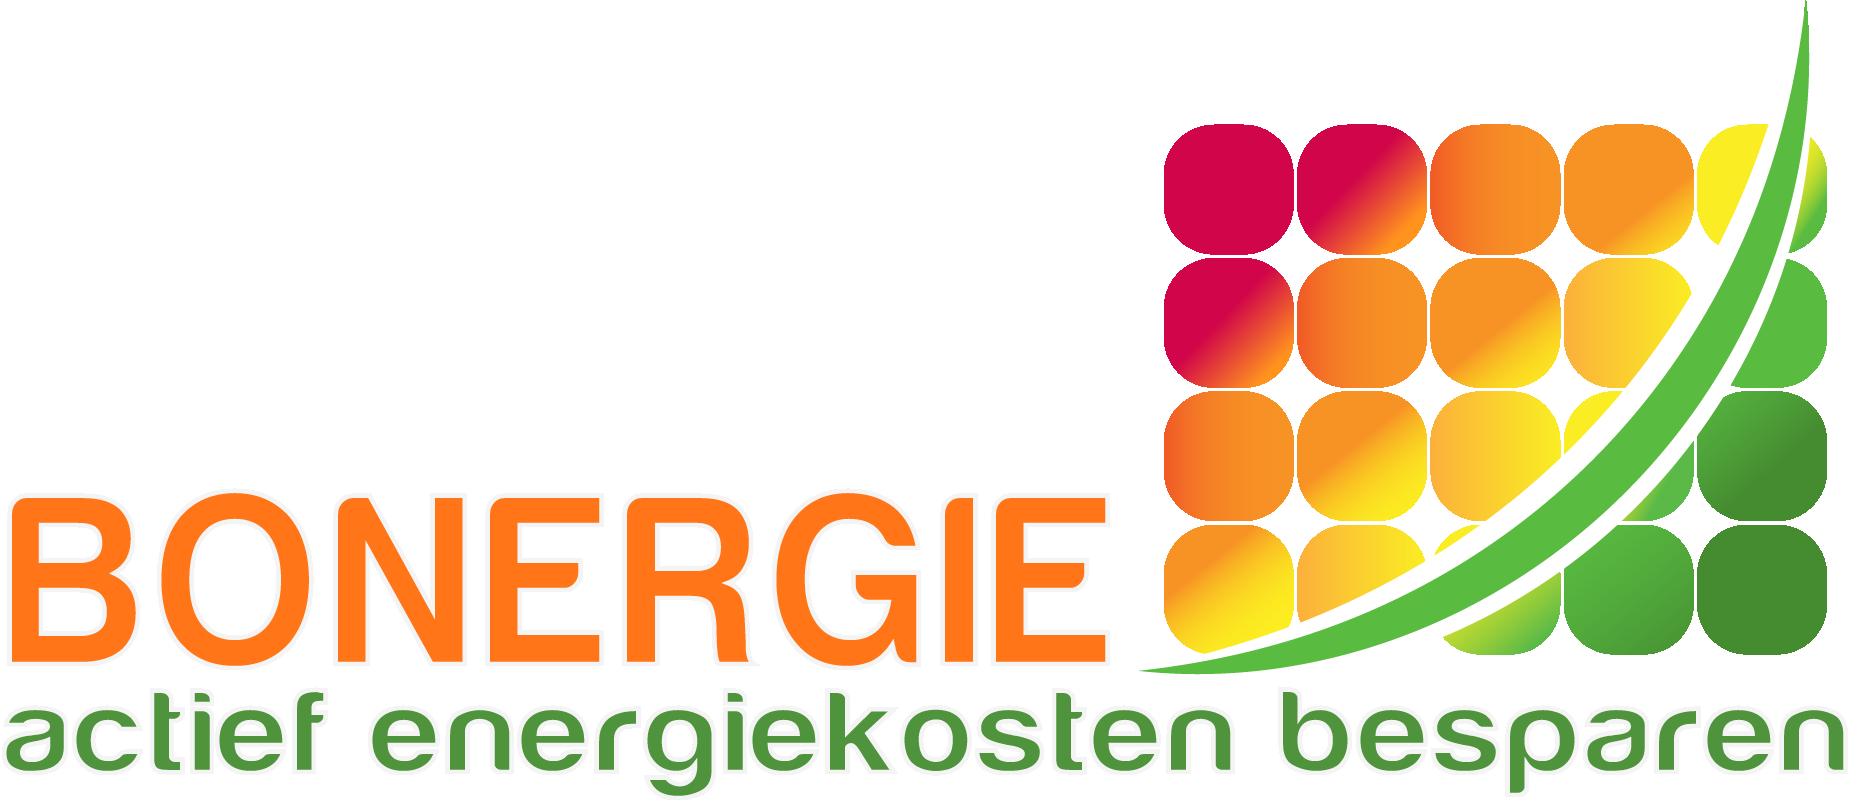 Def_logo_Bonergie